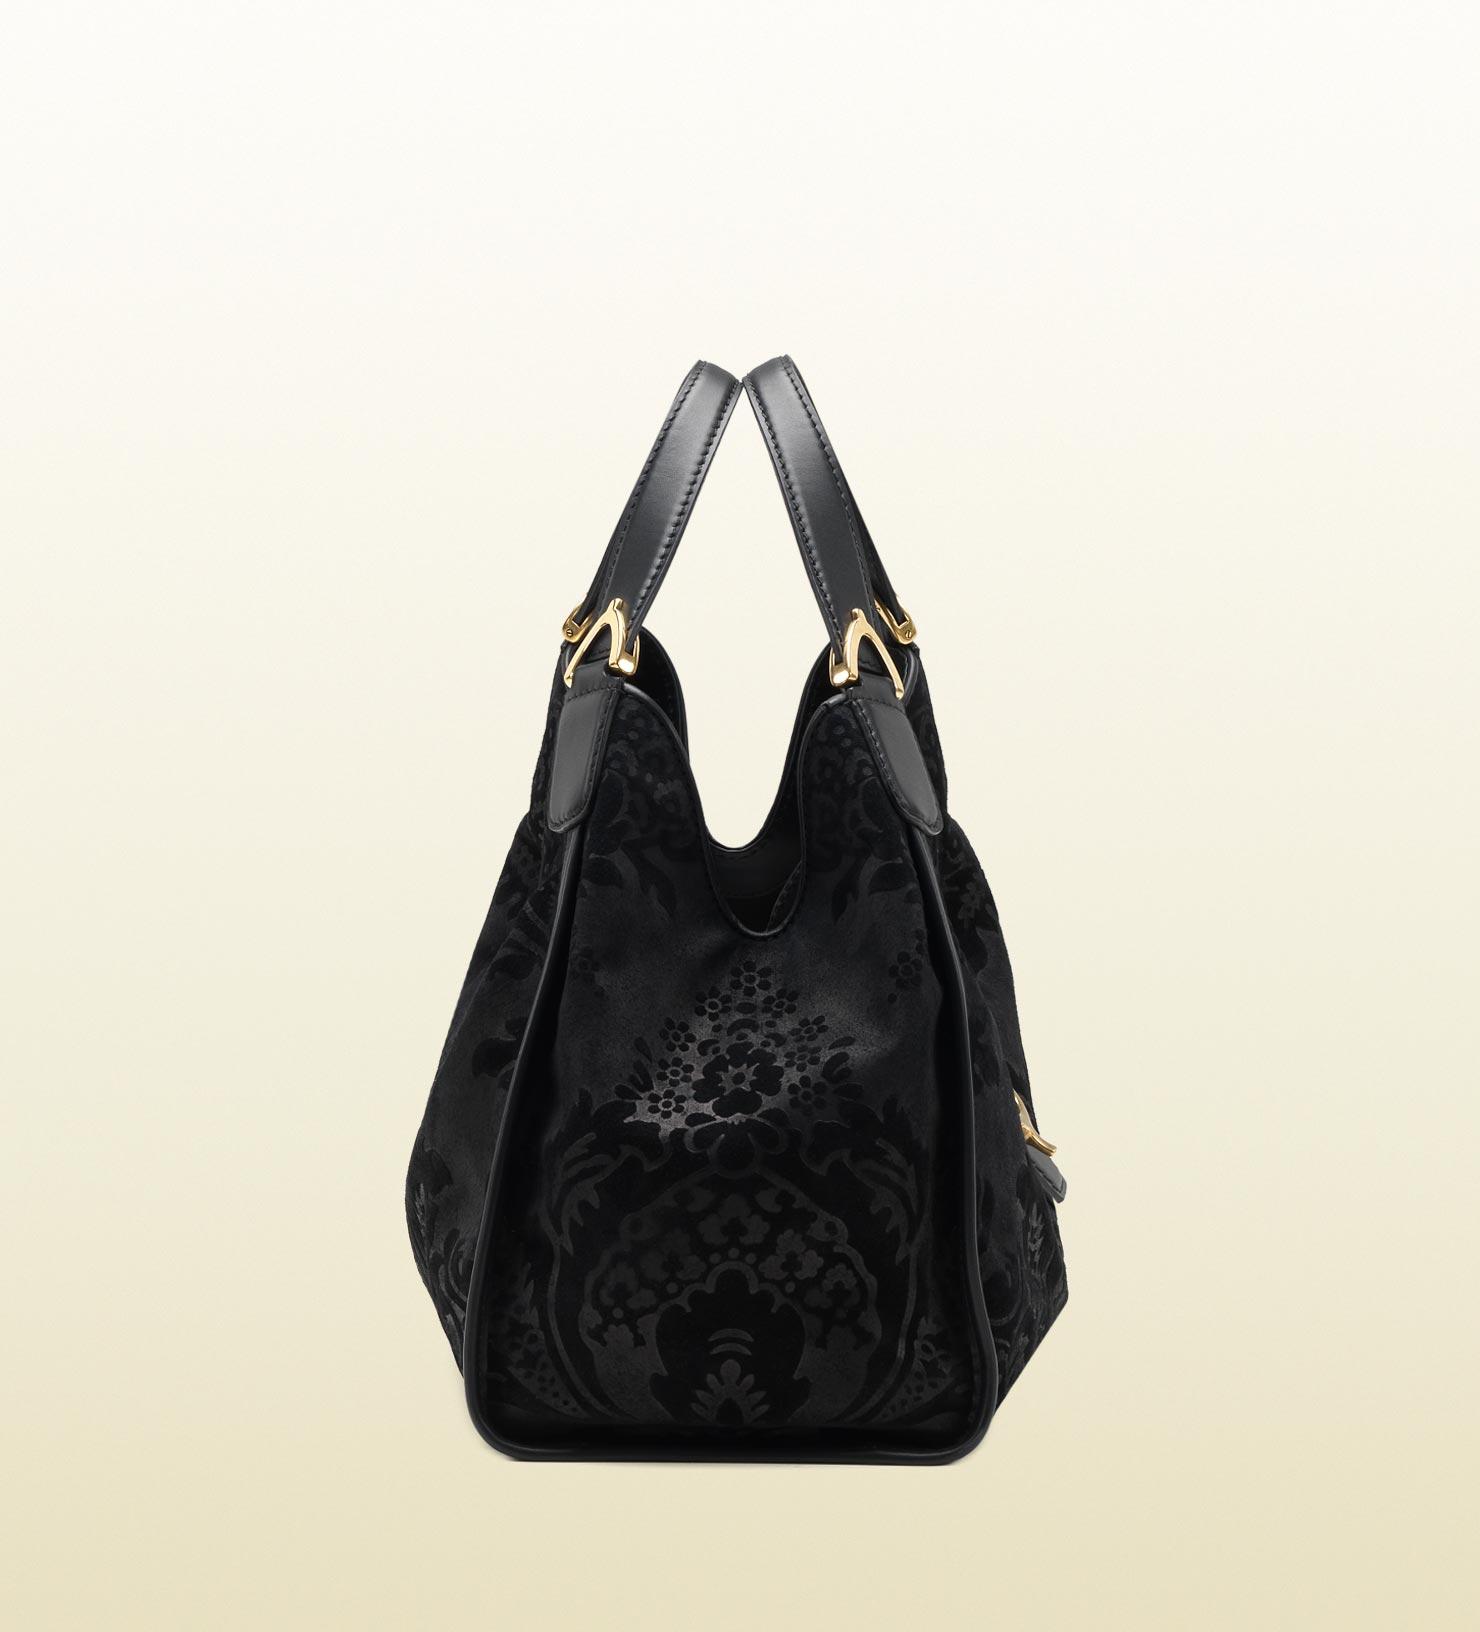 a5f4584067649 Lyst - Gucci Soft Stirrup Brocade Leather Shoulder Bag in Black